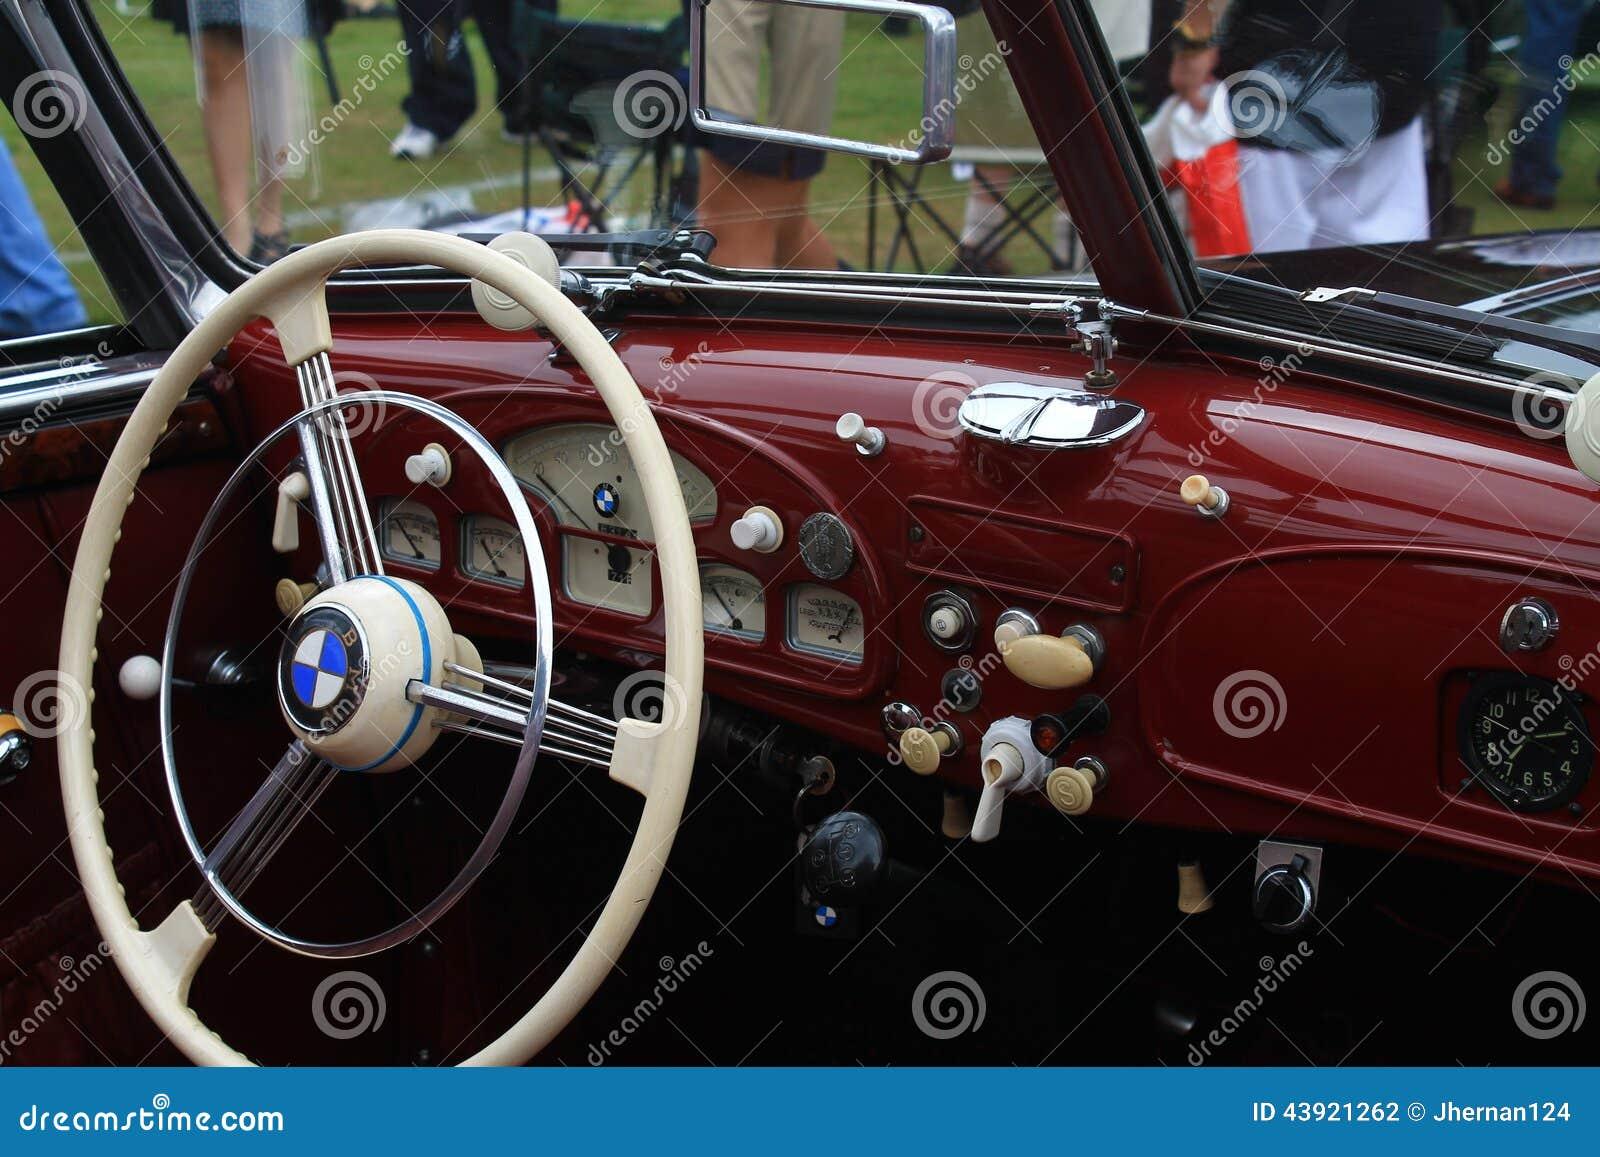 Vintage Bmw Sports Car Interior Editorial Photography Image 43921262